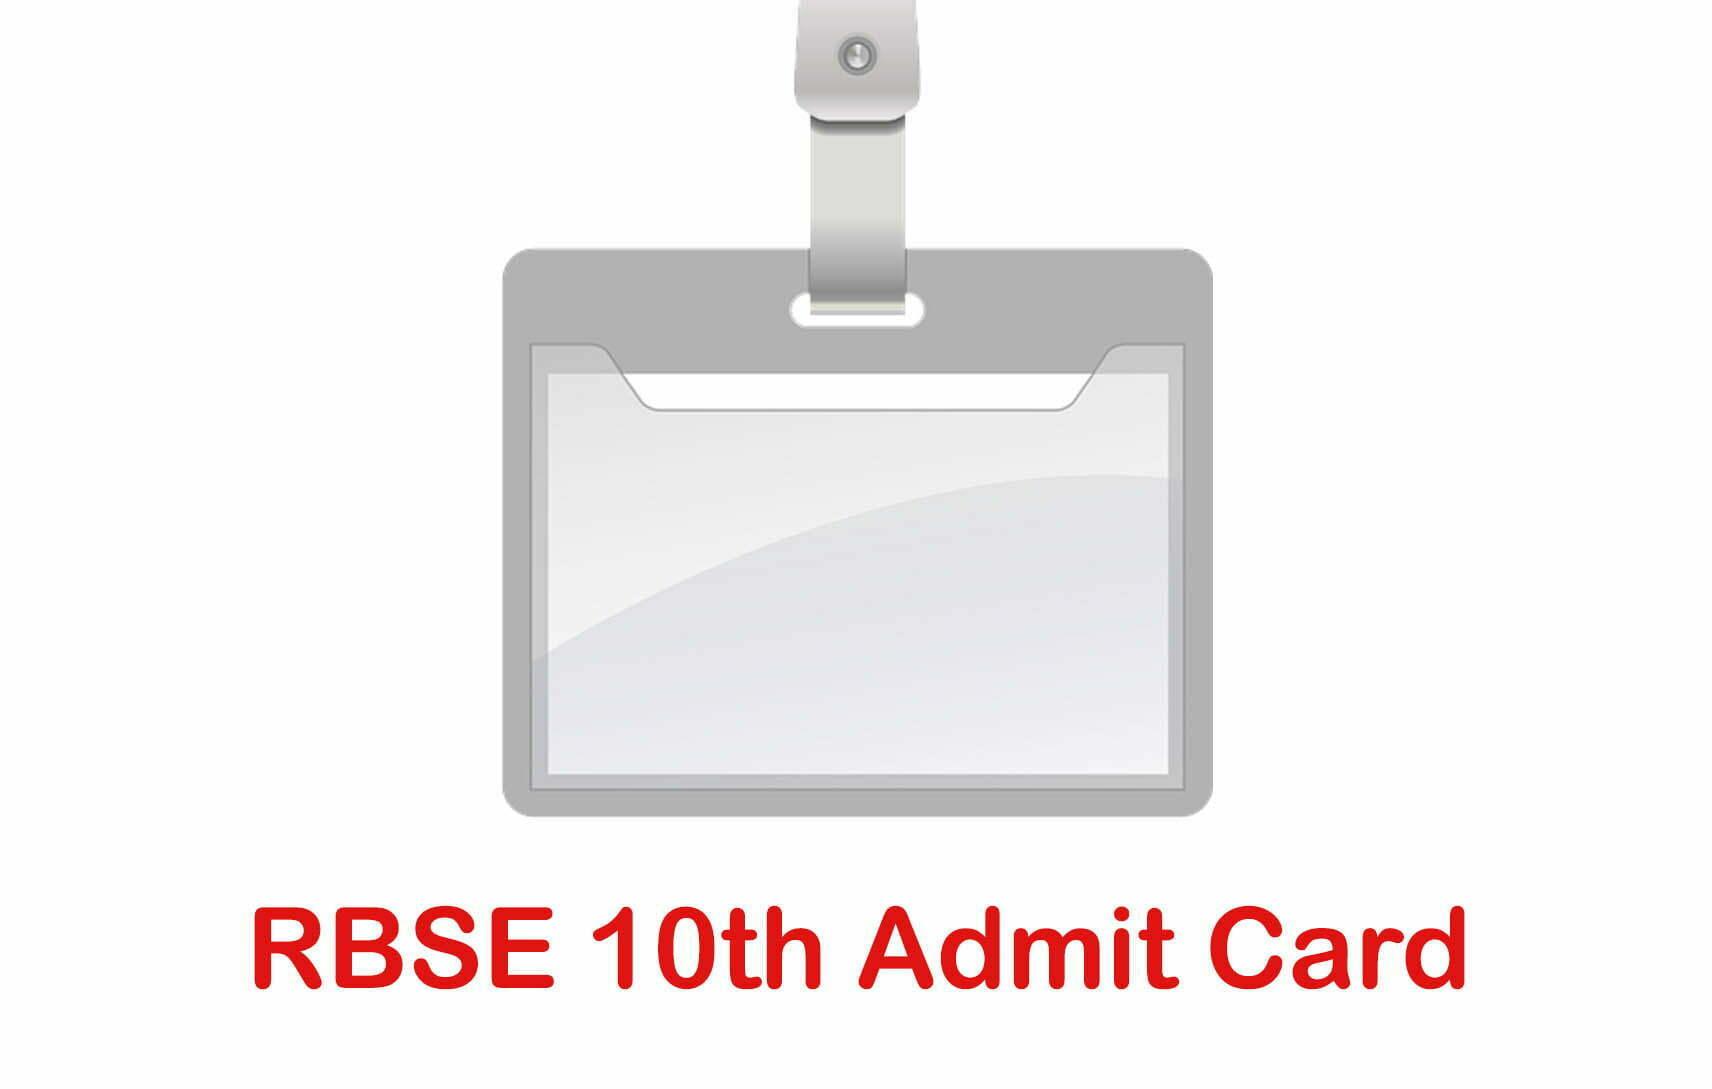 RBSE 10th Admit Card